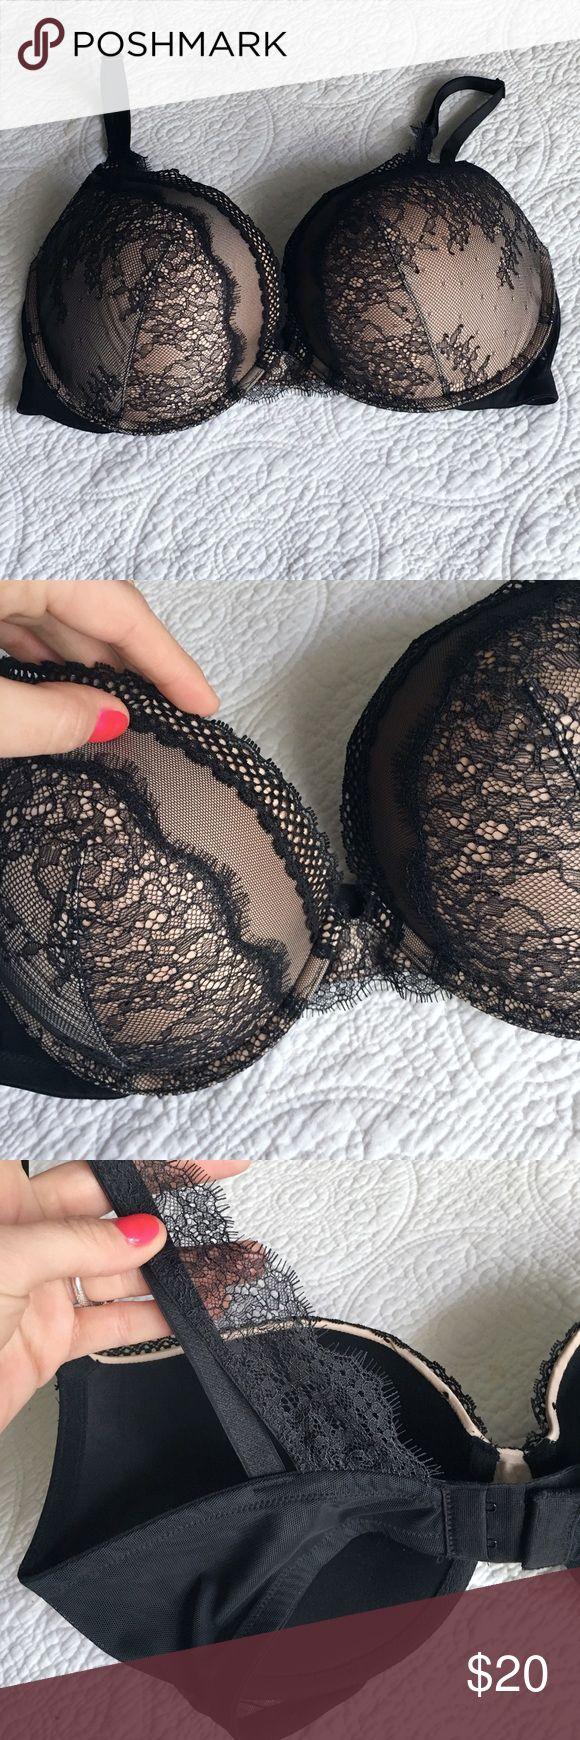 Victoria's Secret 36DD bra NWOT! Very Sexy push-up bra.  Gorgeous lace detailing, especially on back straps! Victoria's Secret Intimates & Sleepwear Bras